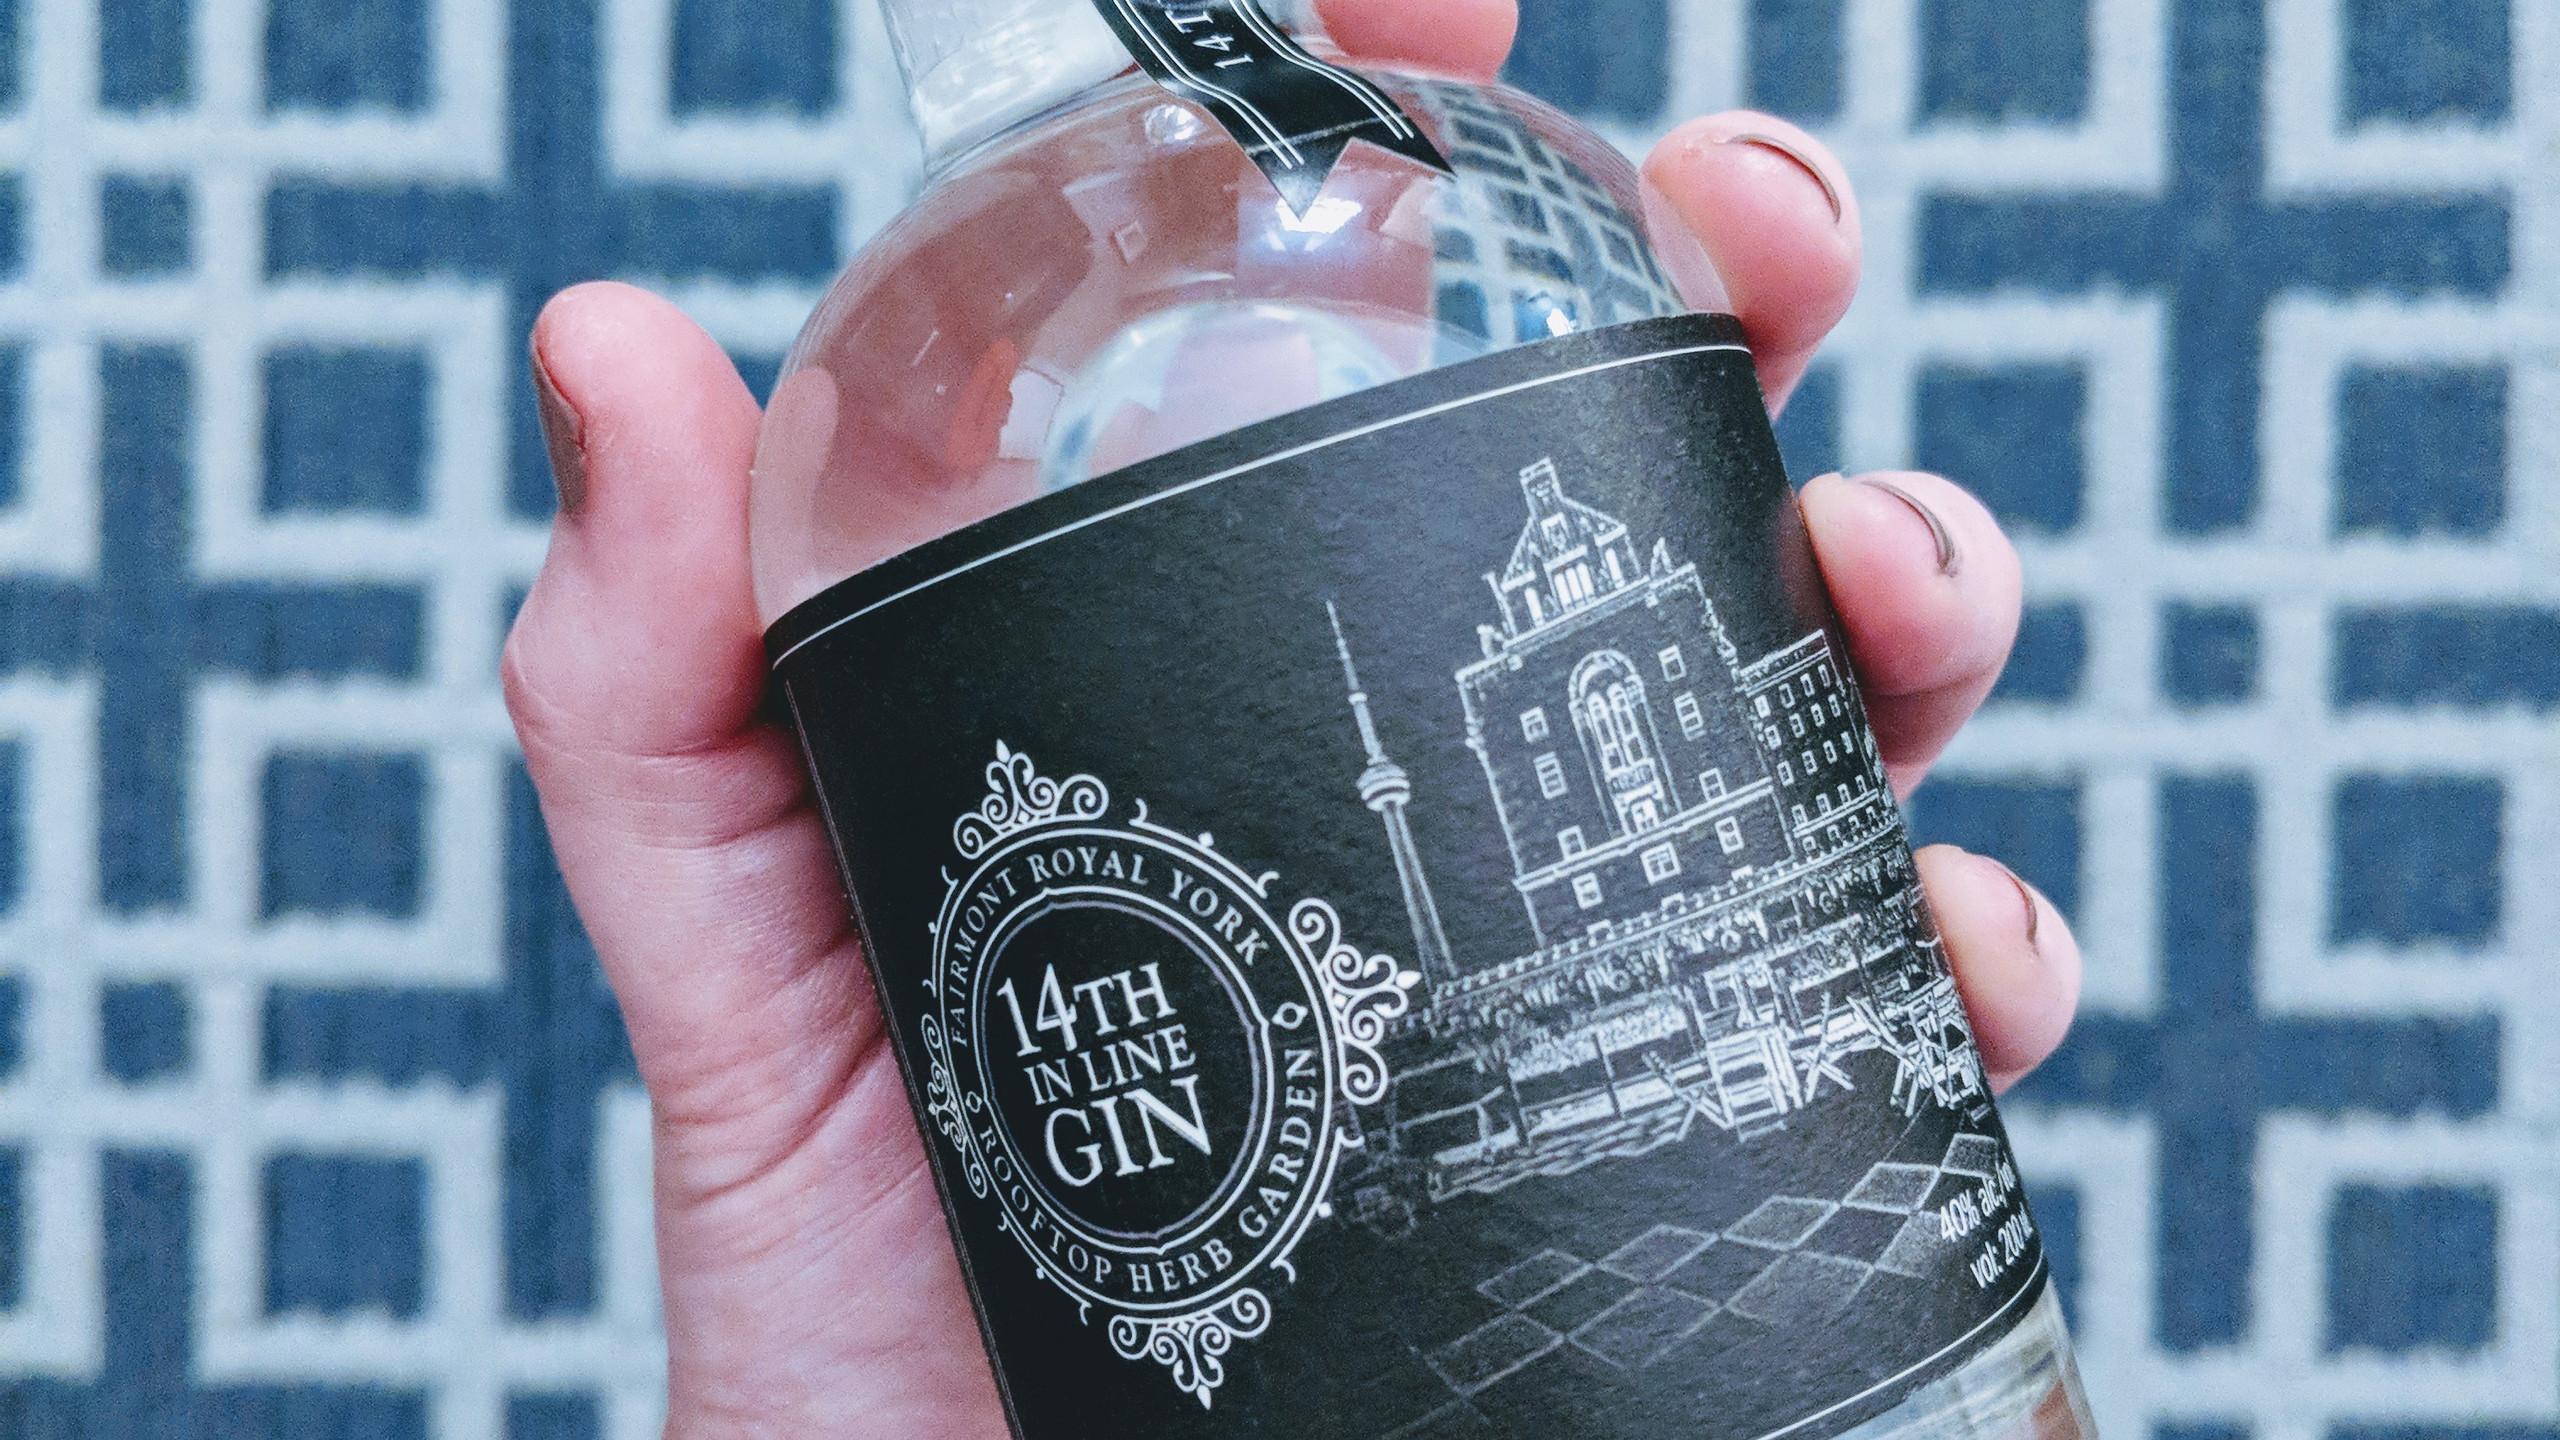 Royal York x Dillon's custom gin!